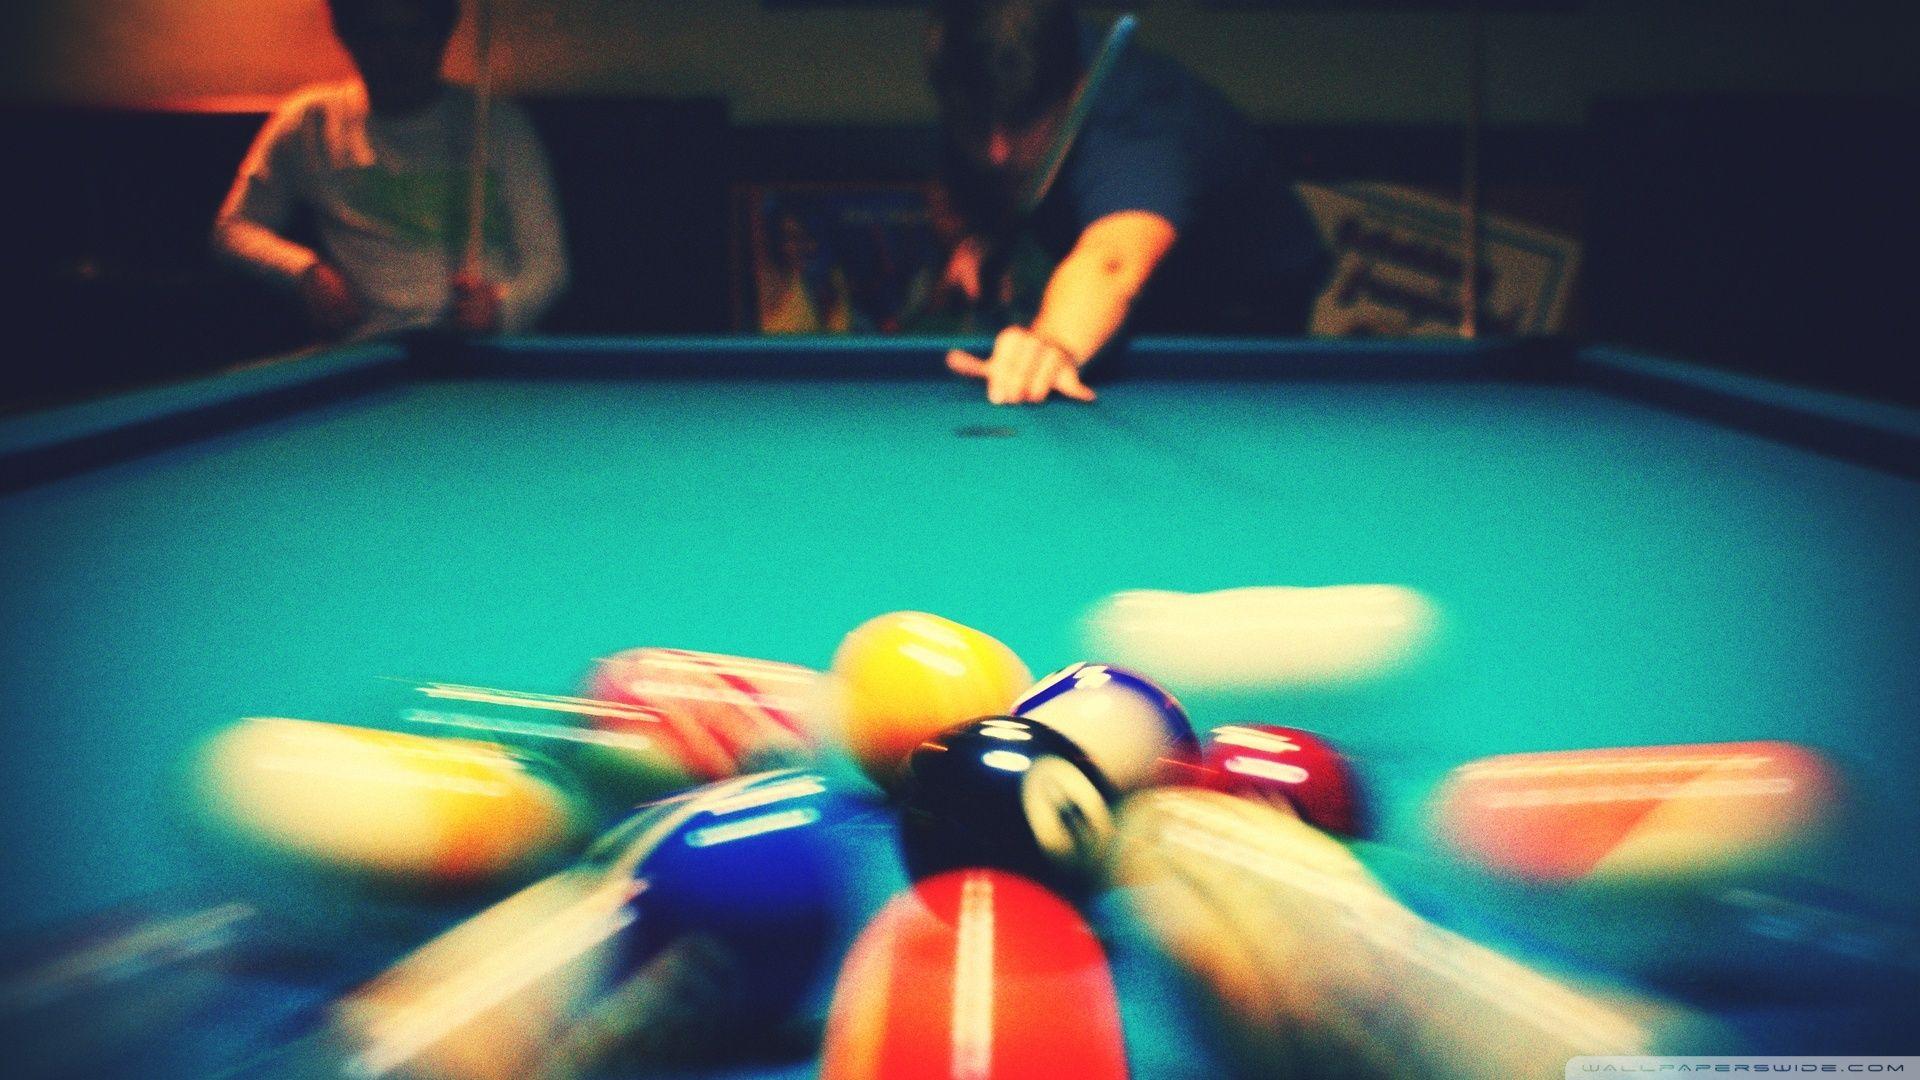 Billiards Wallpaper